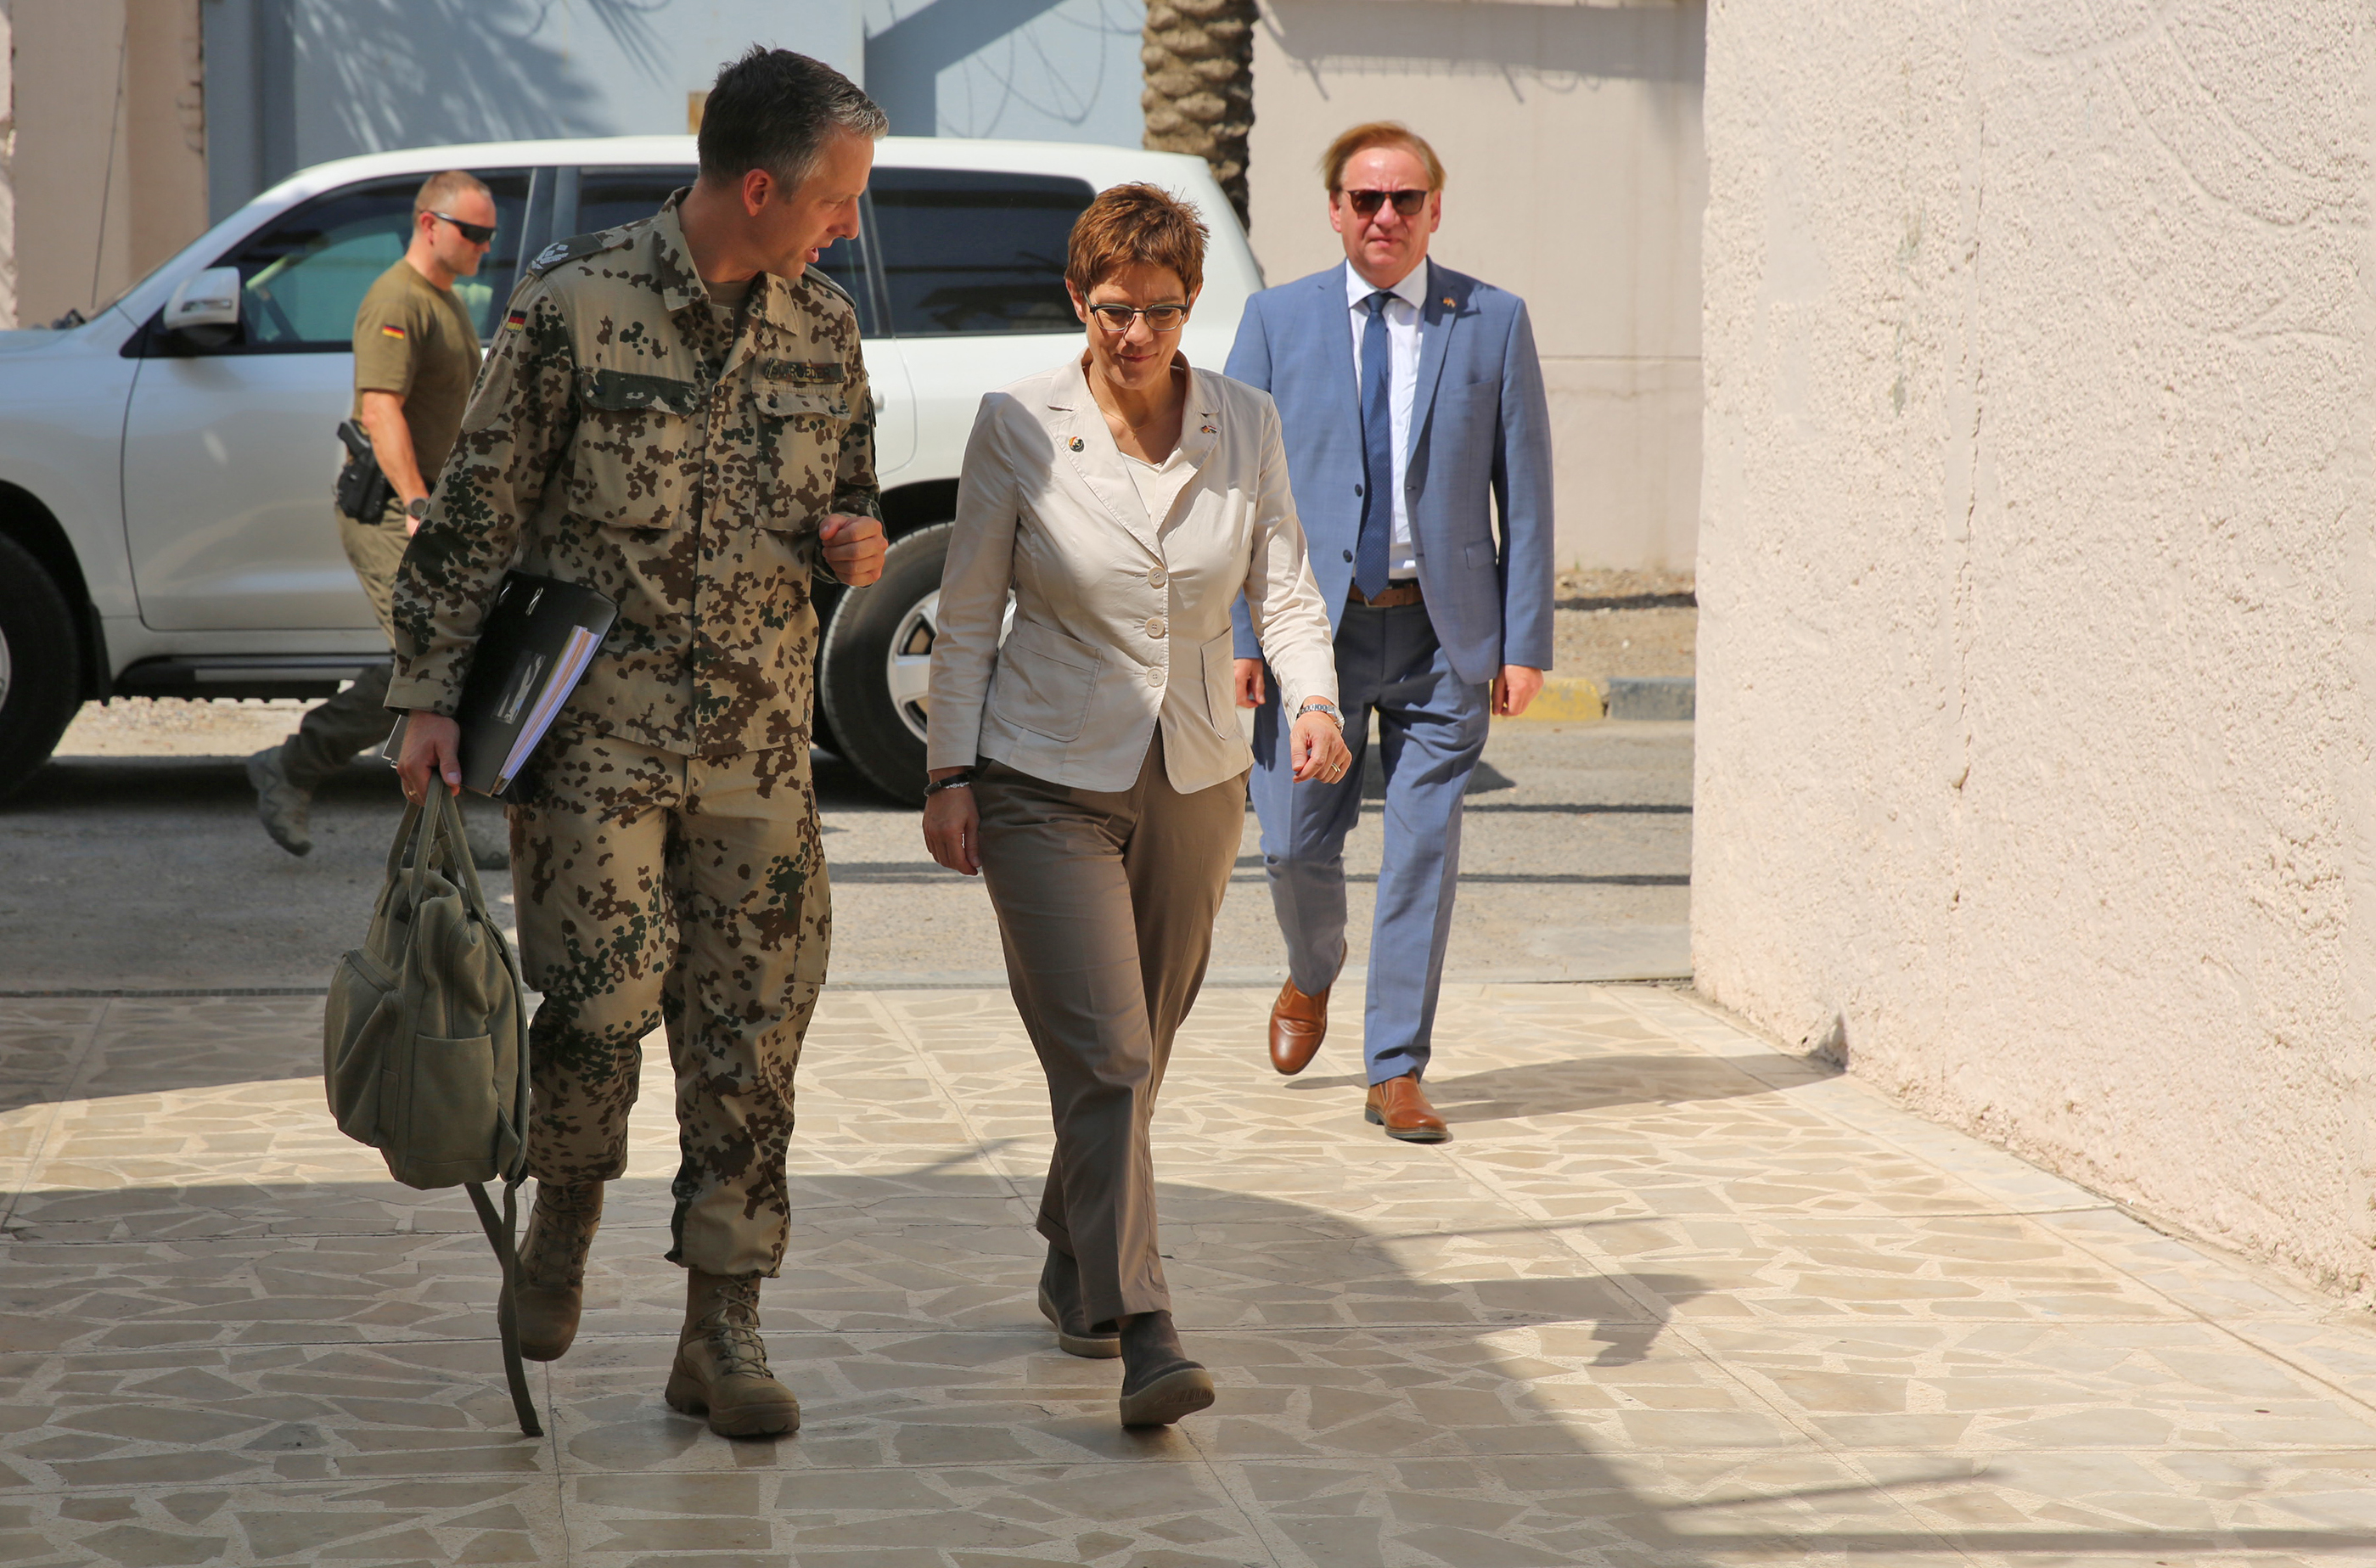 German Defense Minister Annegret Kramp-Karrenbauer (R) walks alongside a German army officer in the German Embassy durning her visit to Baghdad on Aug. 20, 2019. (Sabah Arar/AFP/Getty Images)